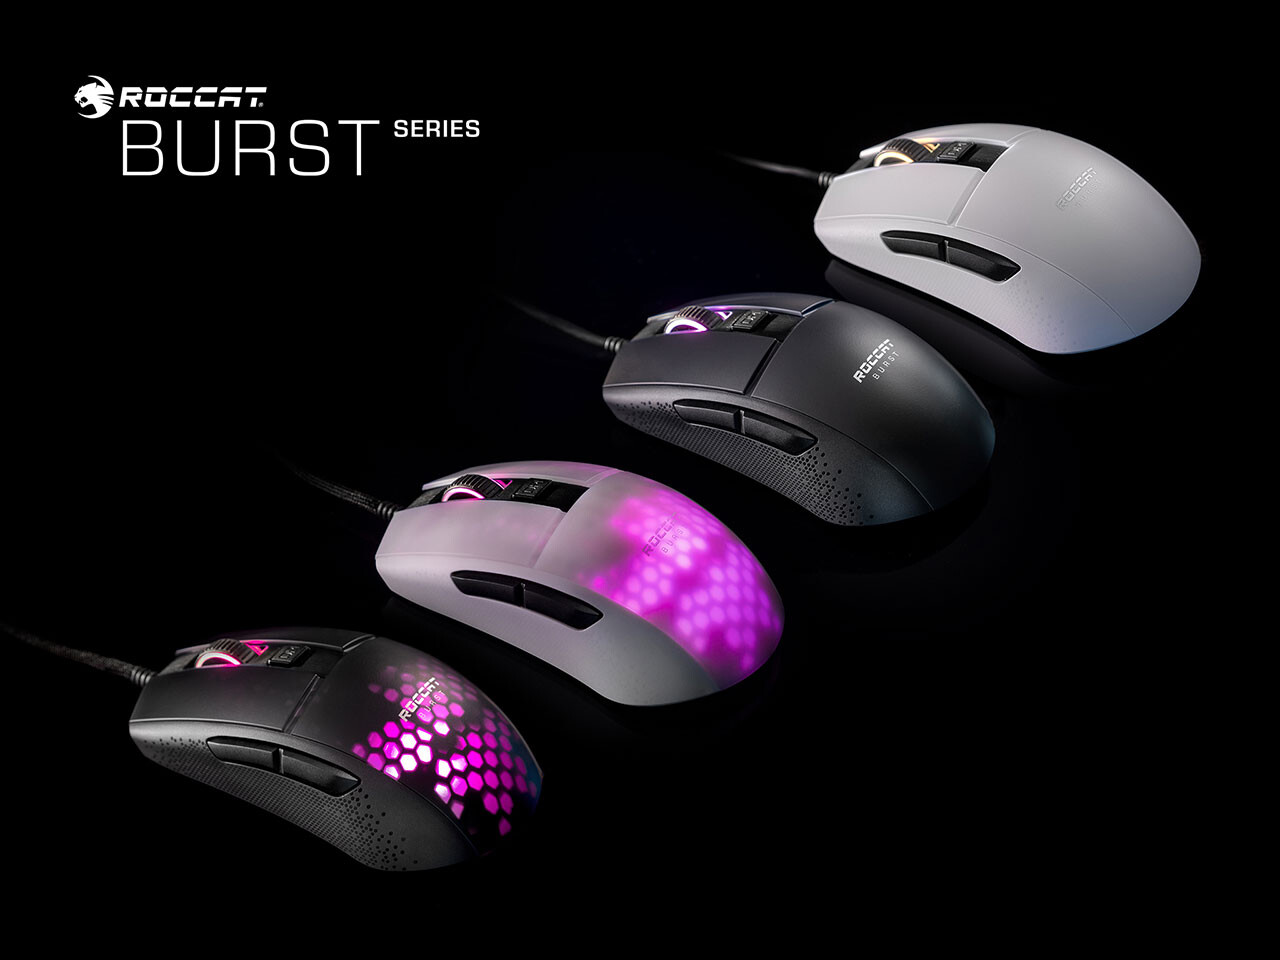 [Giới thiệu] Roccat ra mắt chuột chơi game mới | Roccat Burst Series